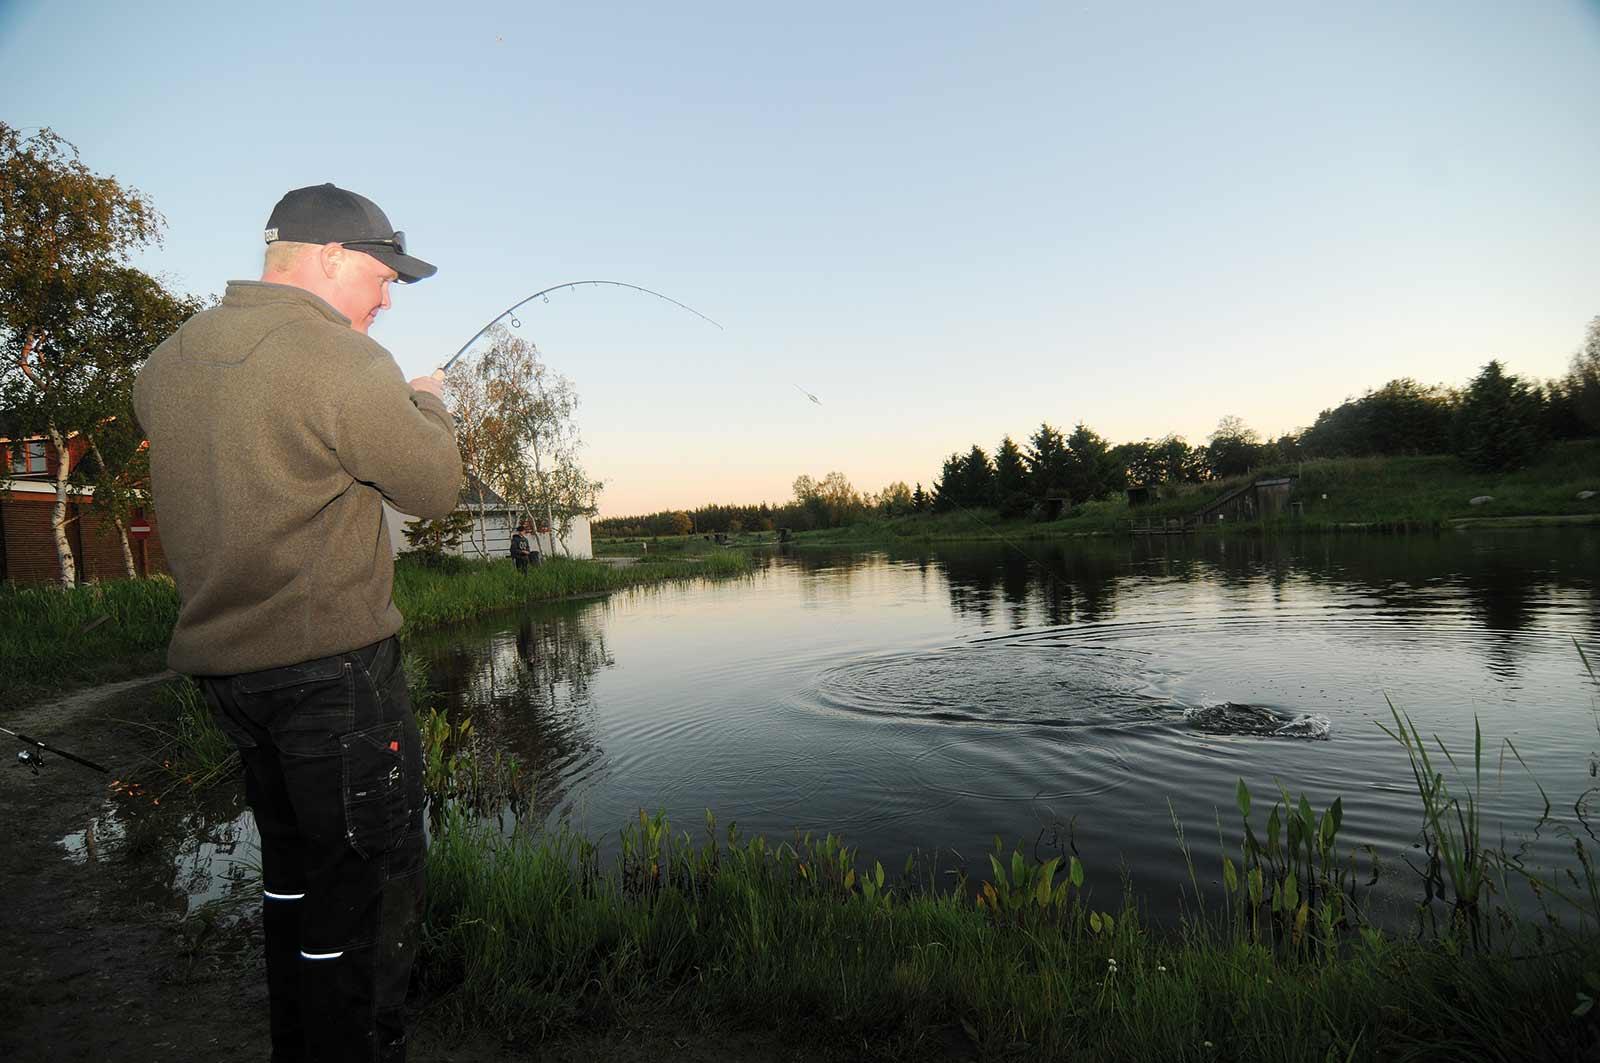 Natfiskeri i put and take´en